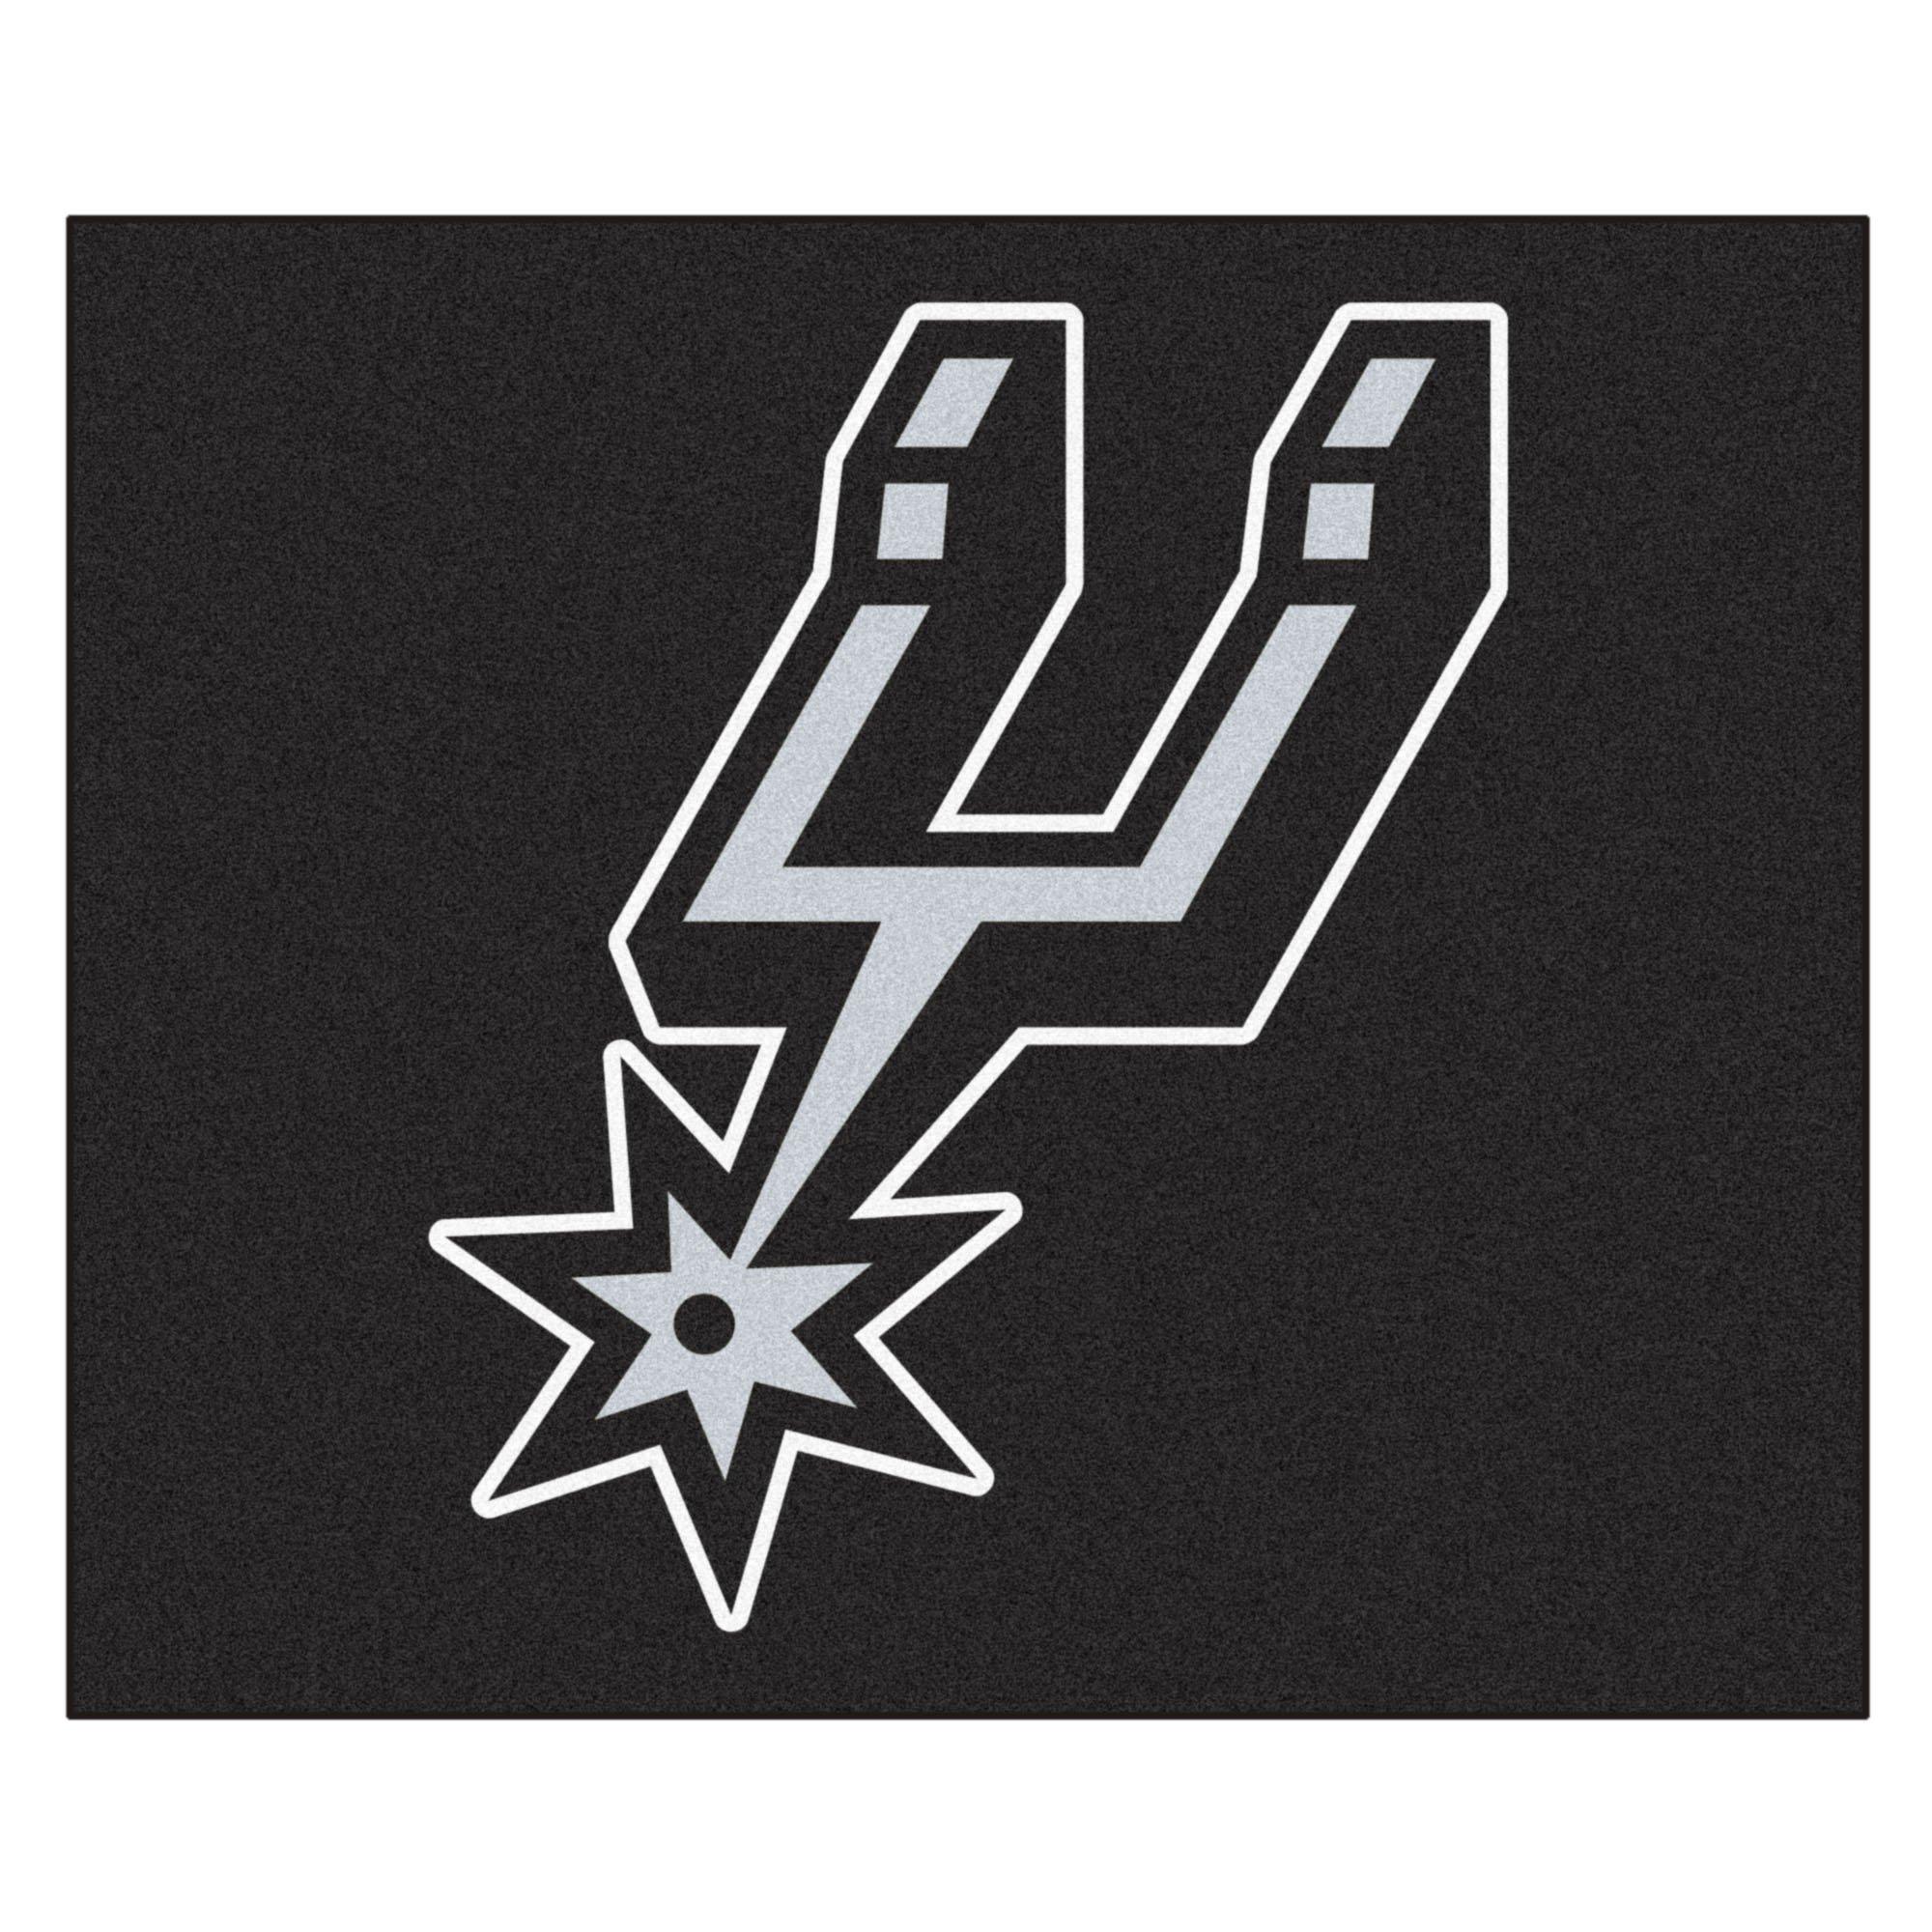 FANMATS 19476 NBA - San Antonio Spurs Tailgater Rug , Team Color, 59.5''x71''